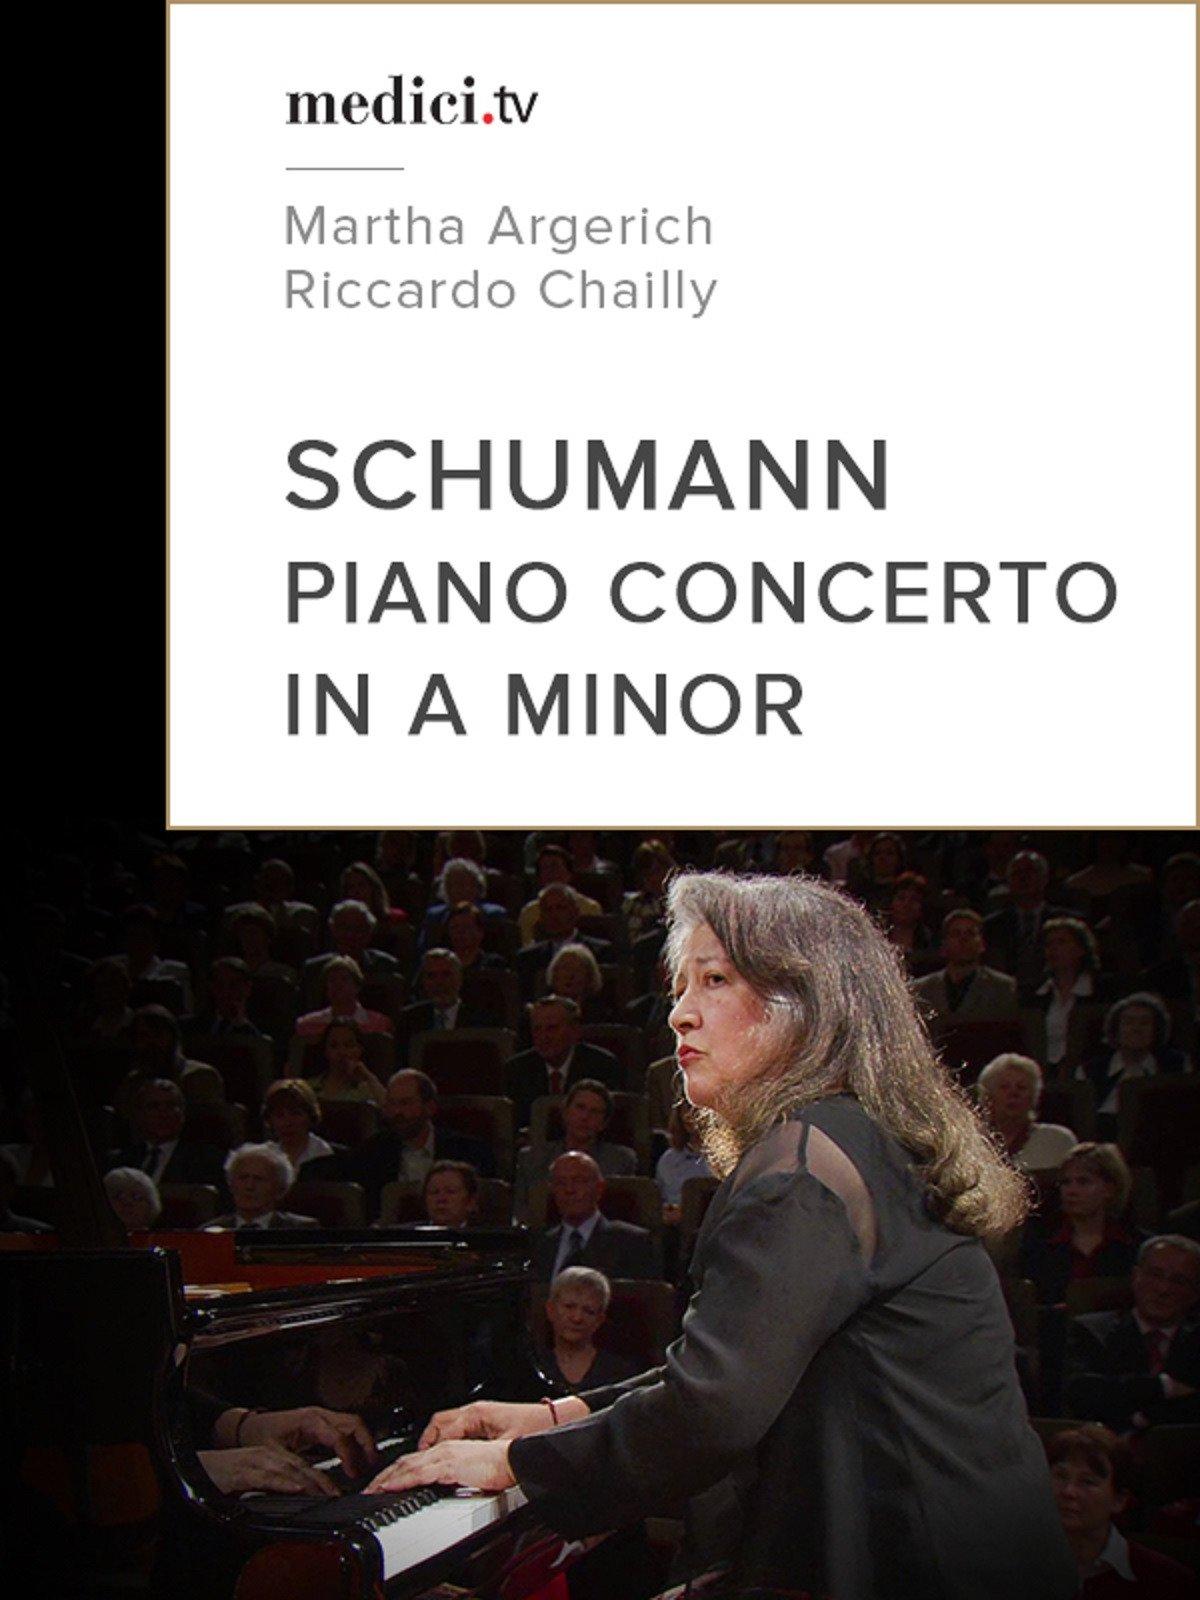 Schumann, Piano concerto in A minor, Op.54 - Martha Argerich, Riccardo Chailly